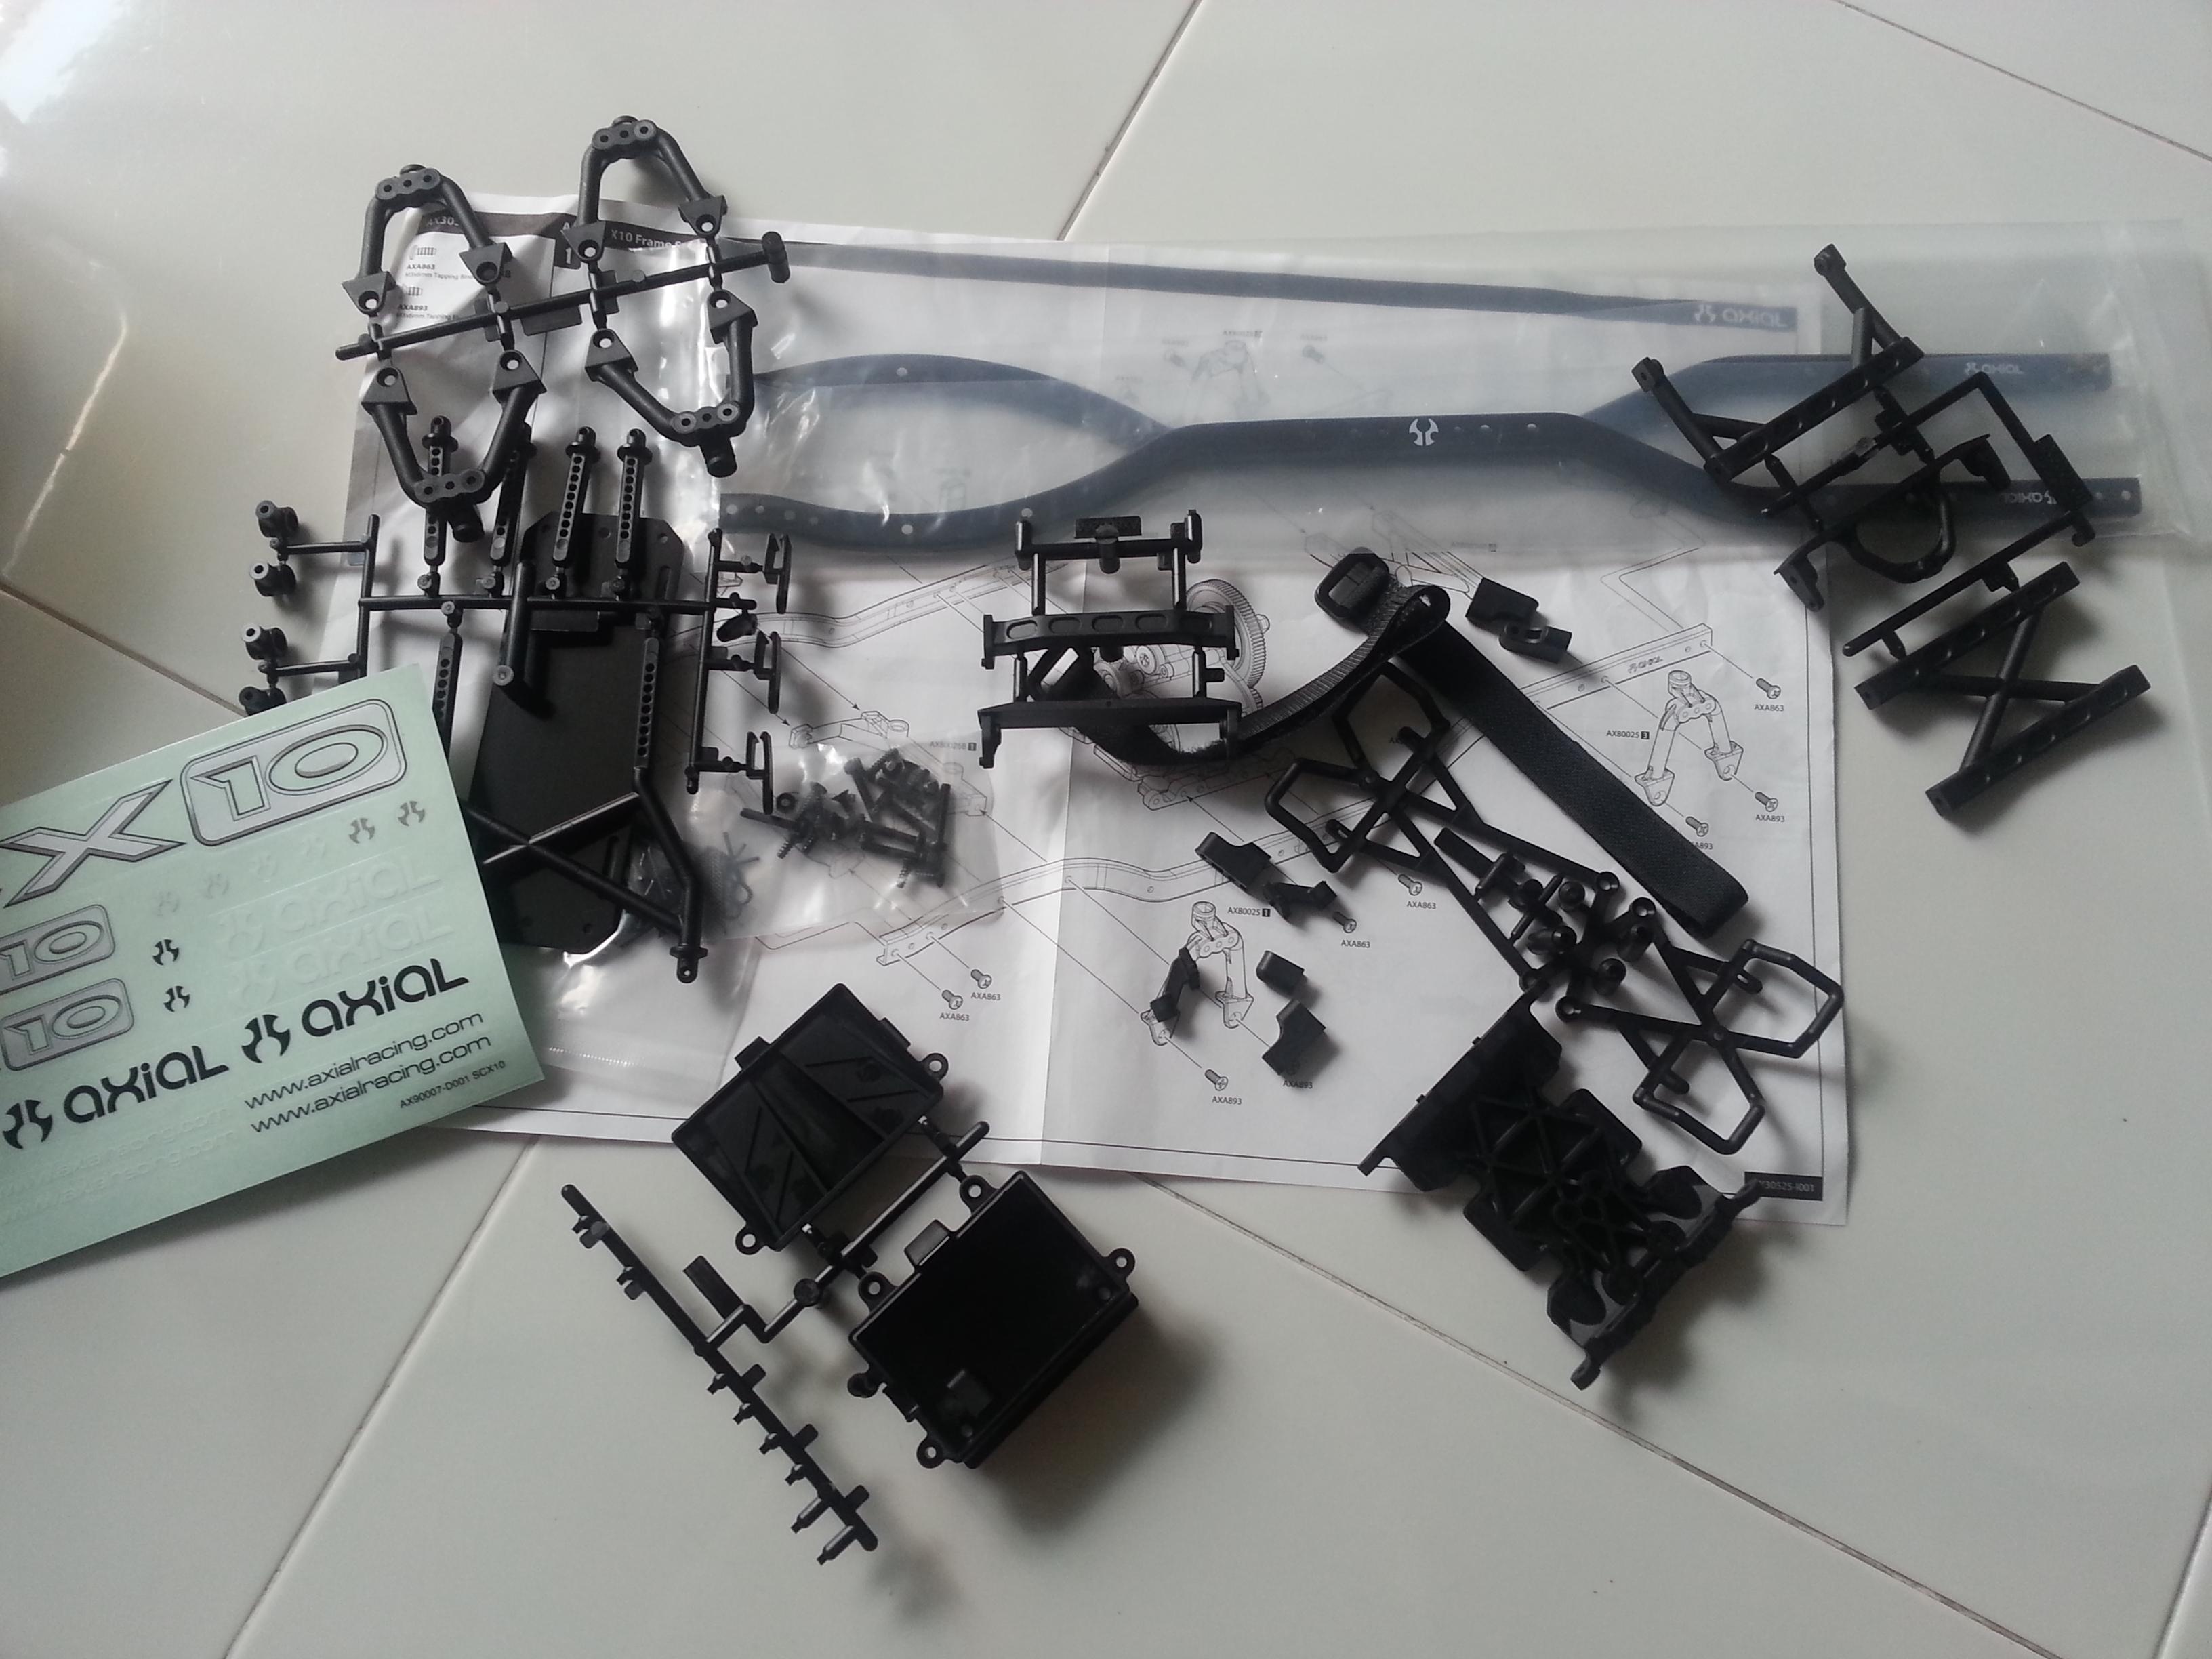 build - Babyboy's first 6x6 build 15589170977_2f2614a89a_o